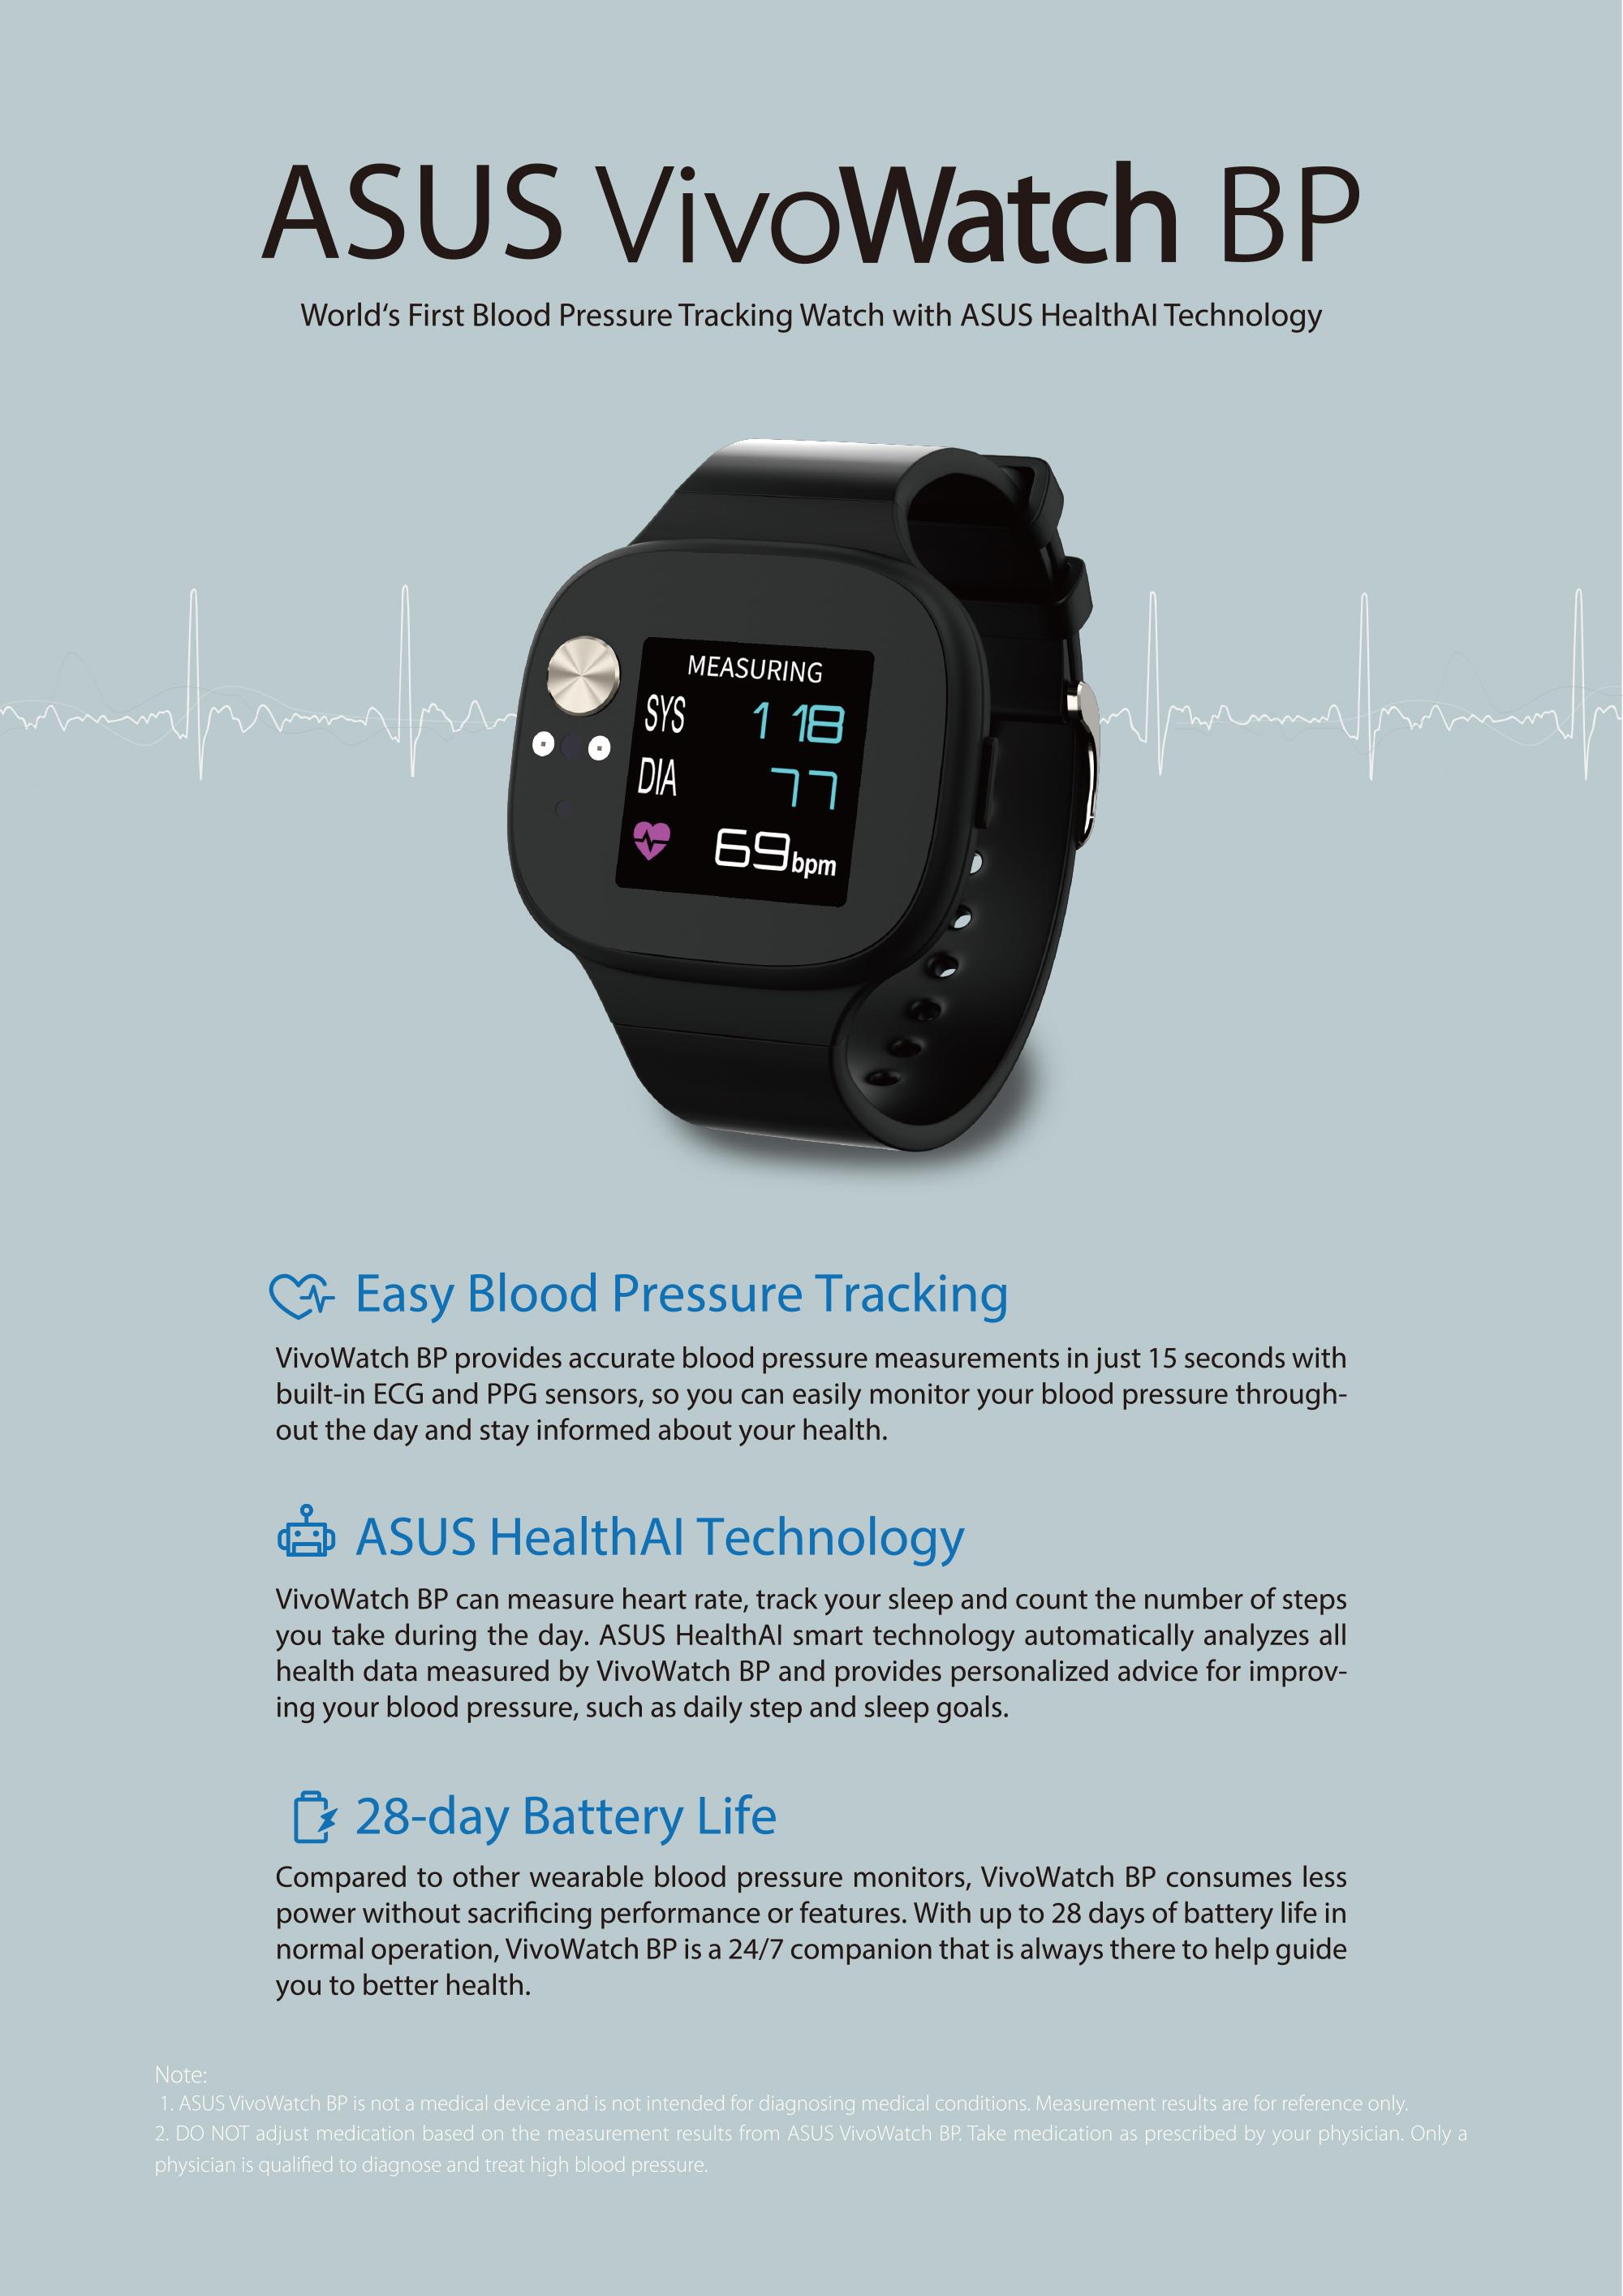 VivoWatch BP (HC-A04) | Health & Fitness | ASUS USA